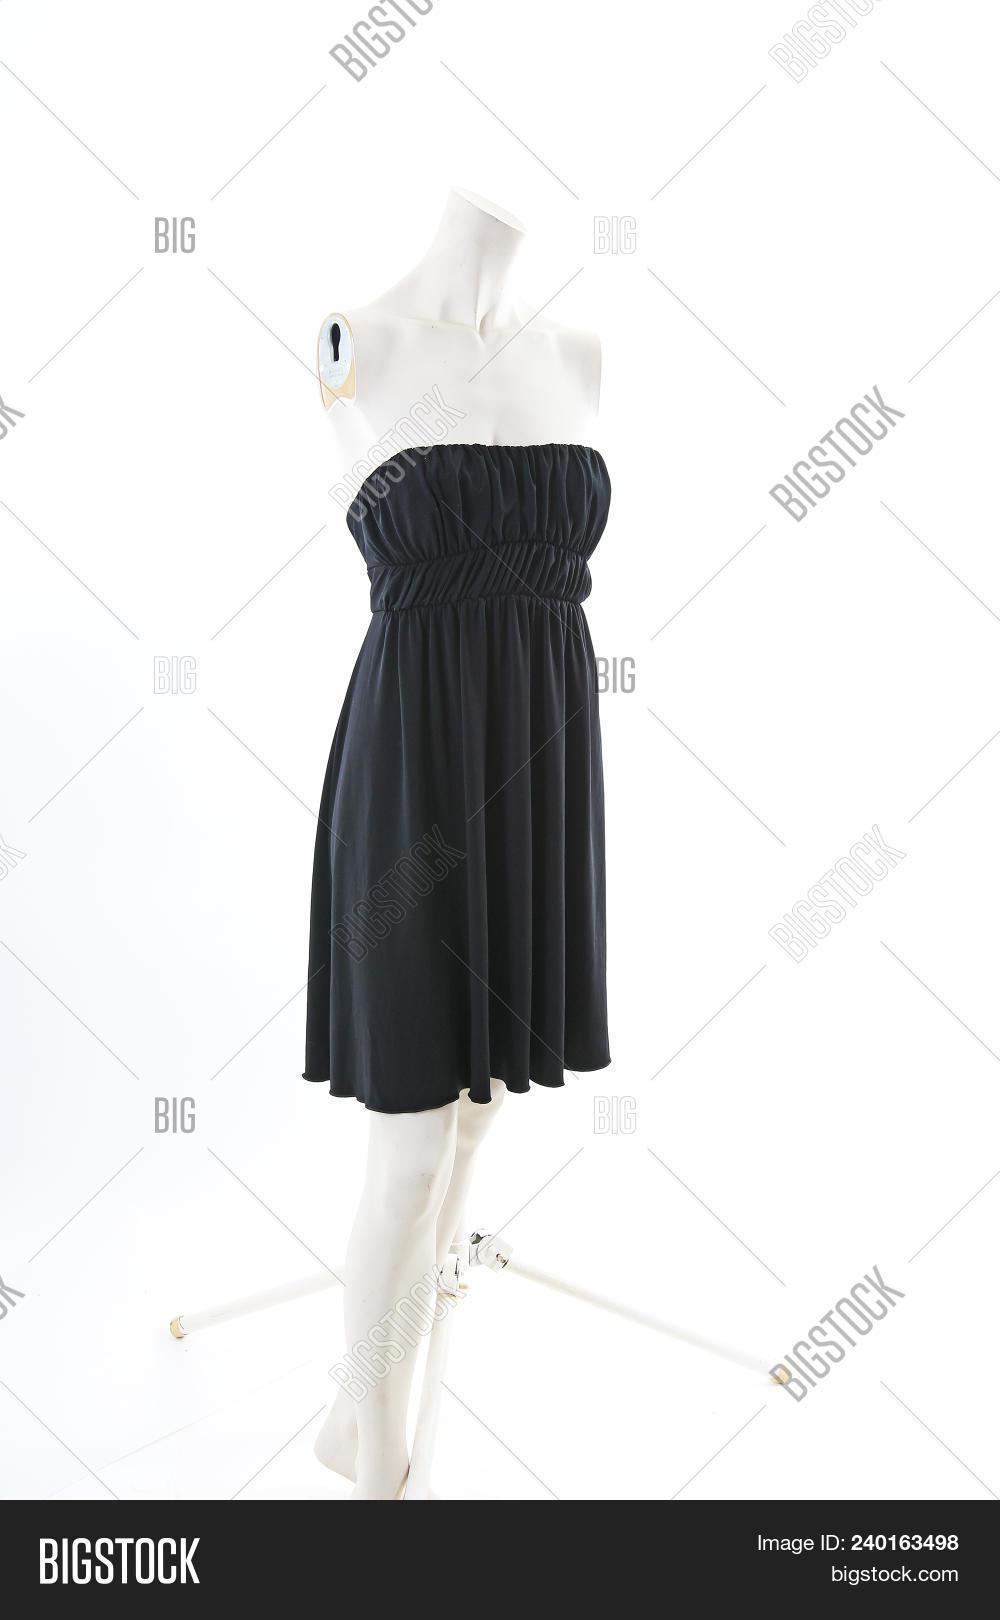 Black Mini Dress On Image Photo Free Trial Bigstock